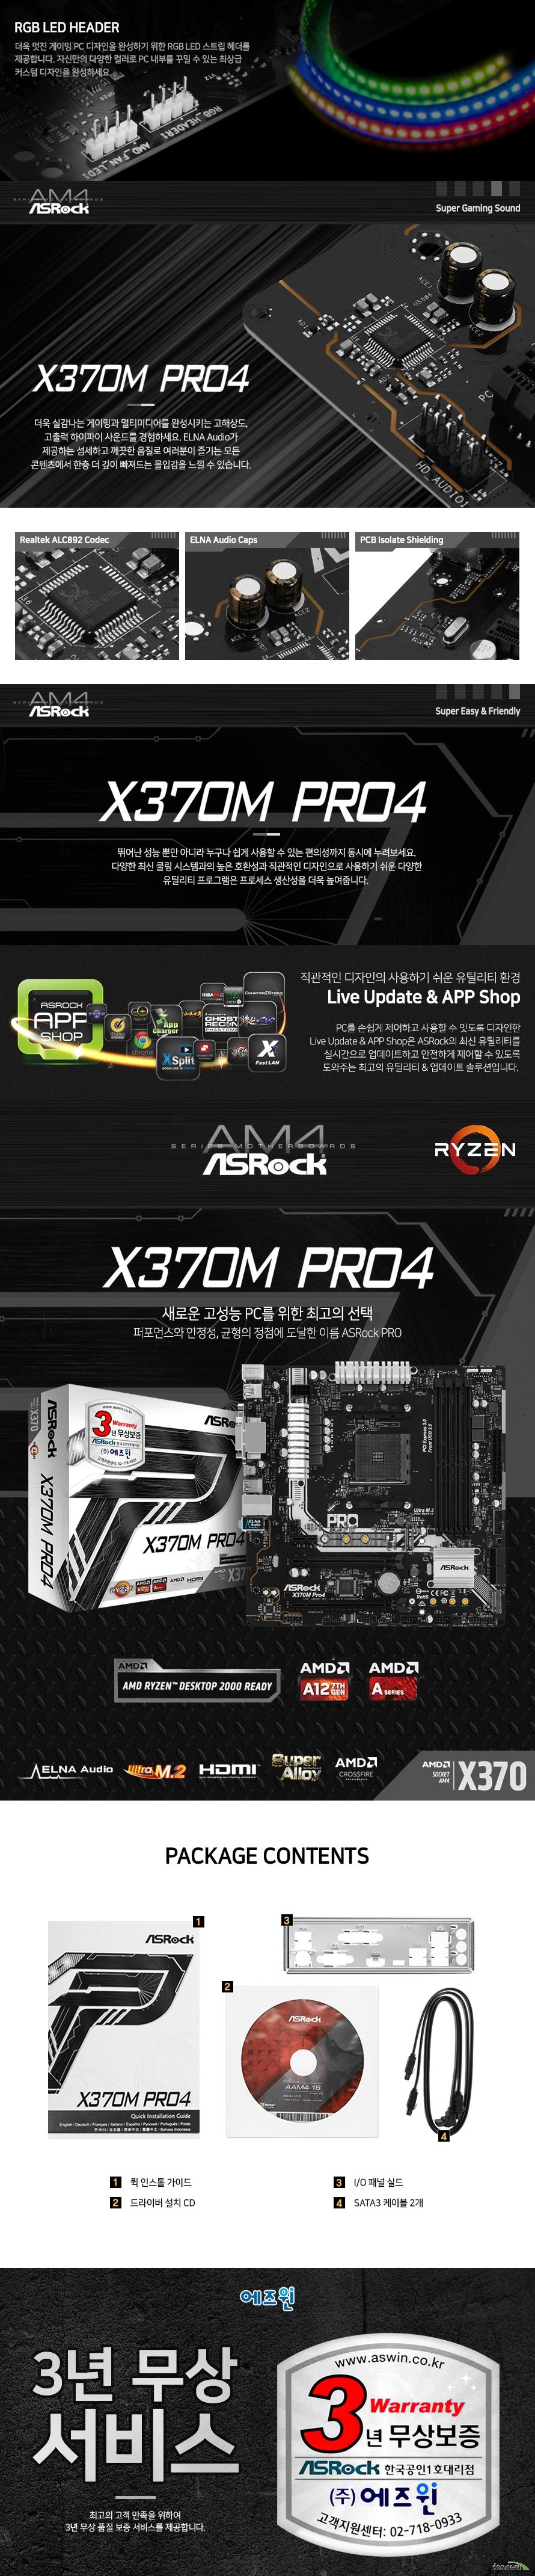 ASRock X370M PRO4 에즈윈